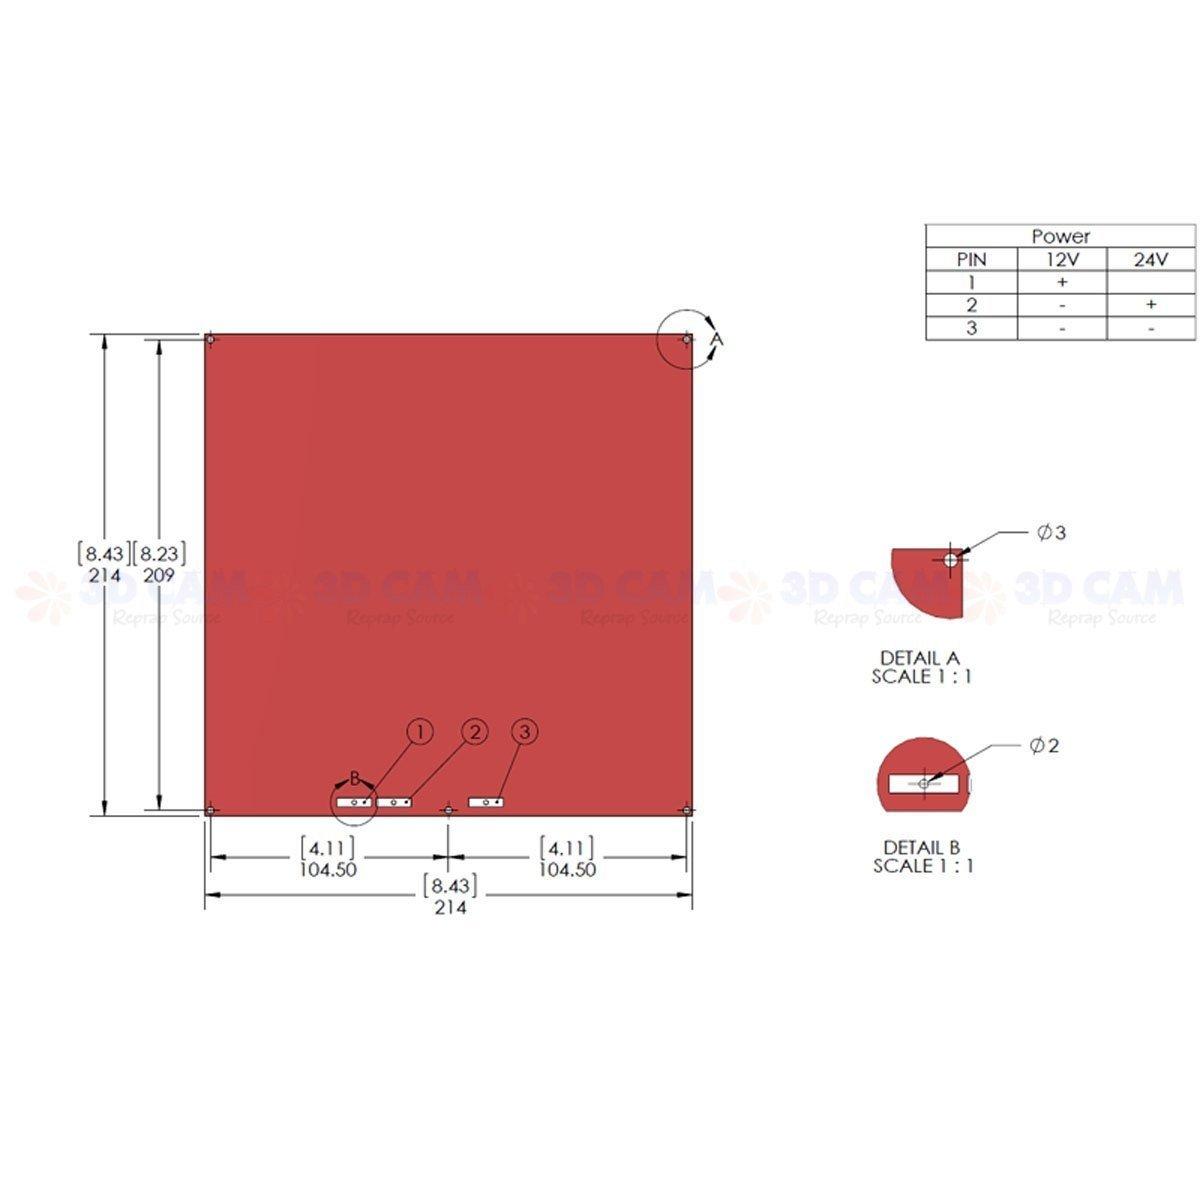 Amazon.com: RepRap Champion MK2B PCB Heated Bed Heat Bed RepRap for 3D  Printer 12V / 24V + Wiring + Thermistor: Industrial & Scientific